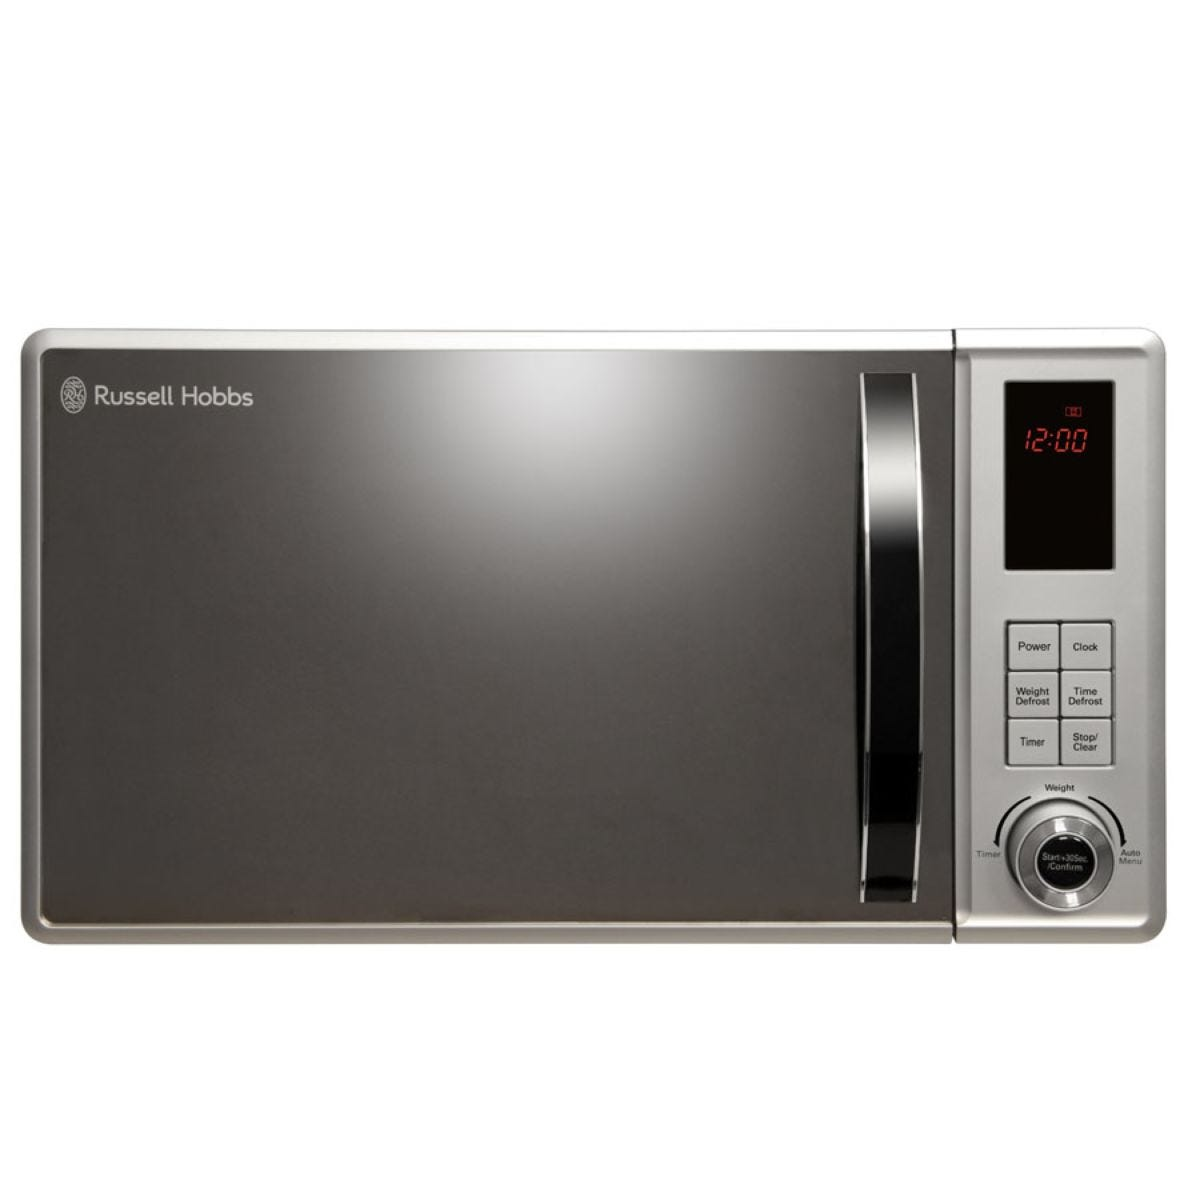 Russell Hobbs RHM2362S 800W 23L Digital Microwave - Silver